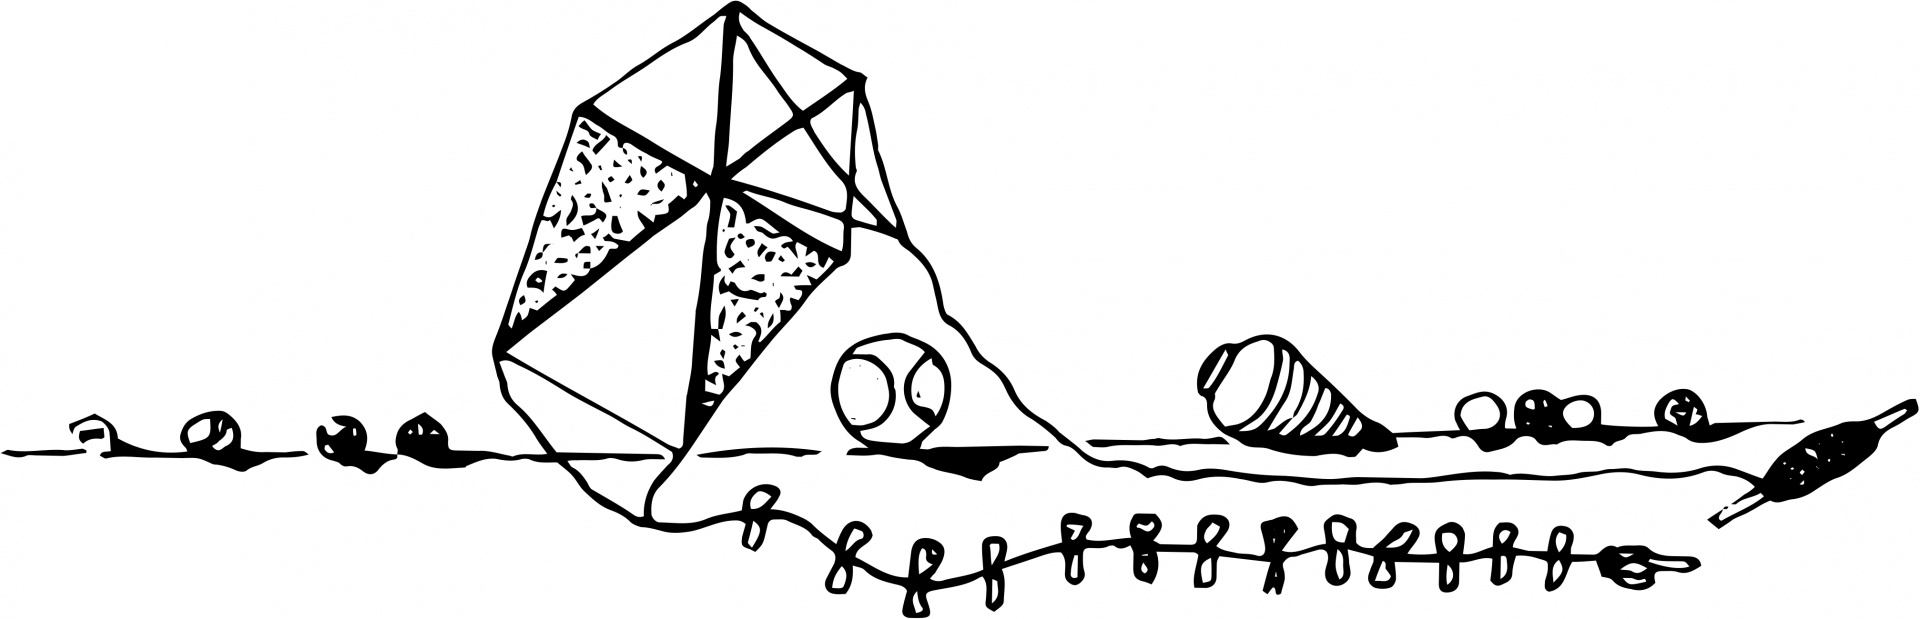 Clip art graphic illustration. Kite clipart old